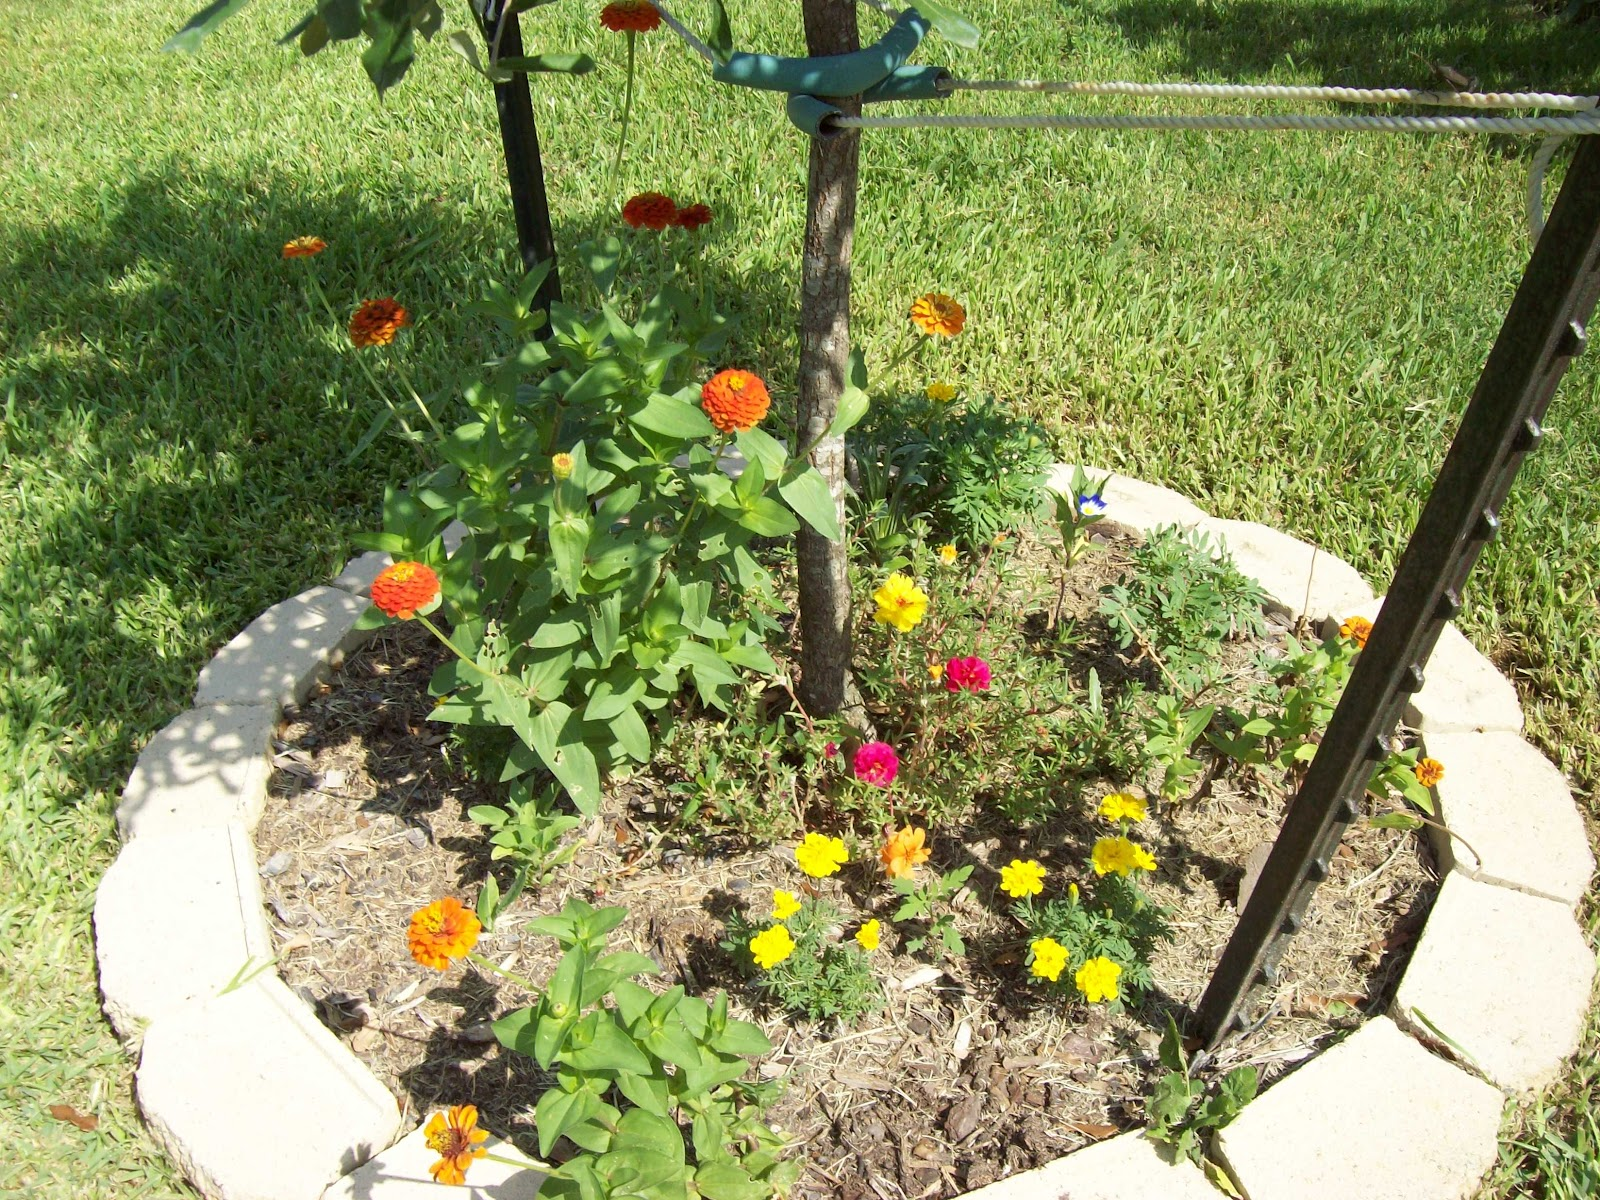 Gardening 2009 - 101_4898.JPG